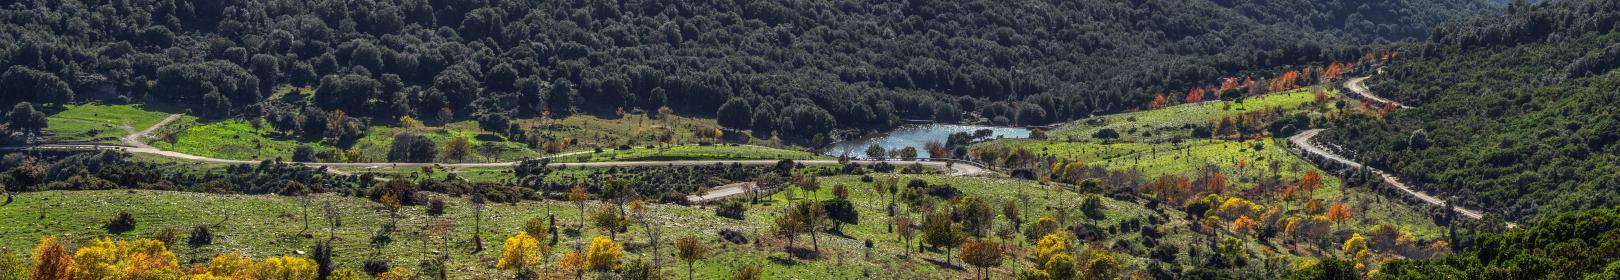 Genna Orruali ottobre 2020 panoramica (foto Cristian Mascia)